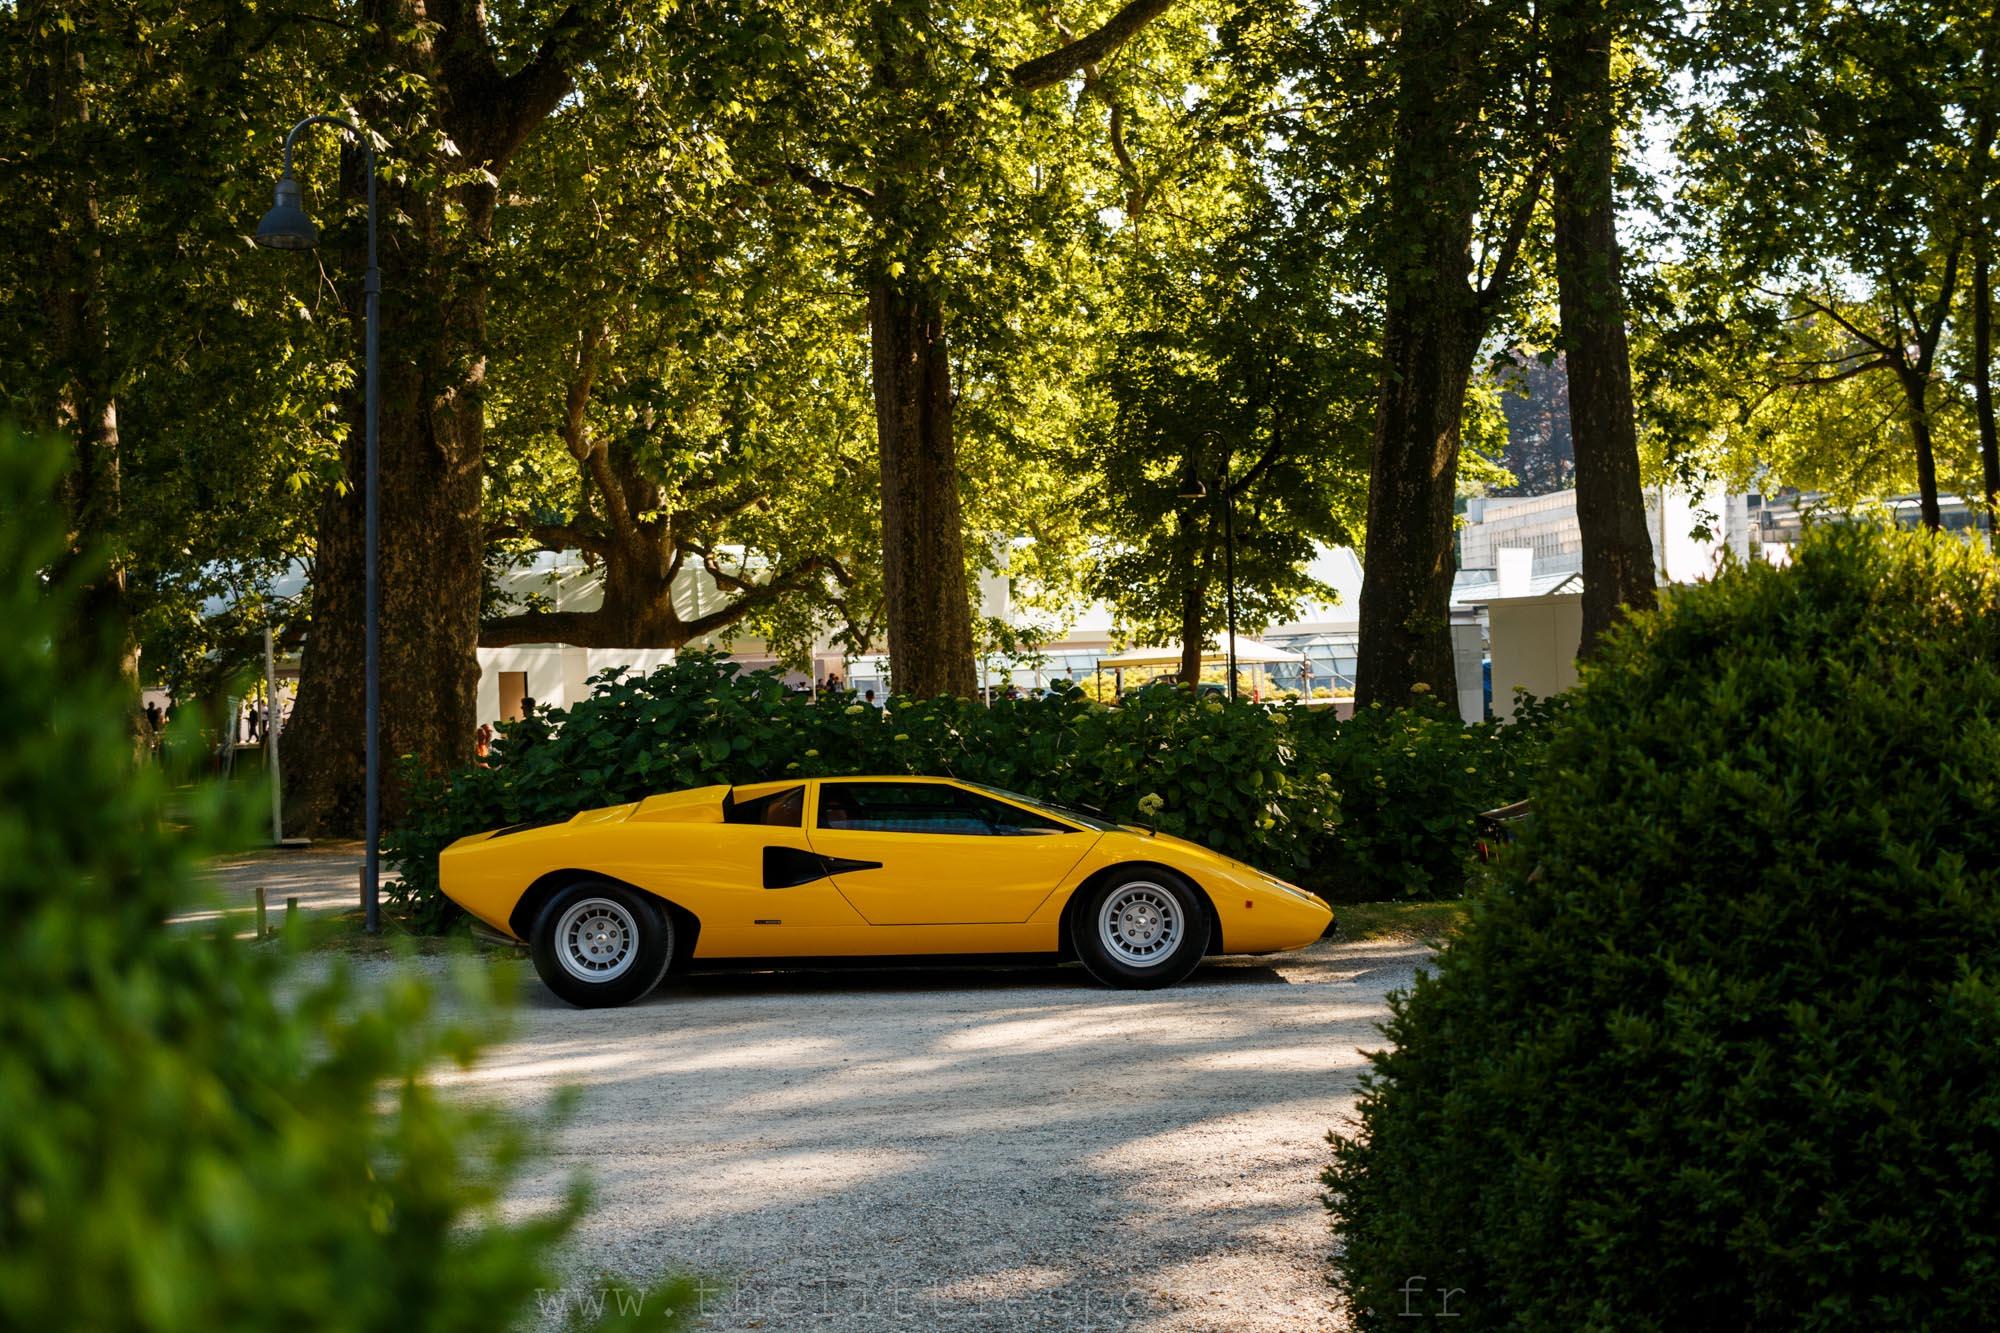 Lamborghini Countach LP400 Periscopio, adjugée 817 600 euros.